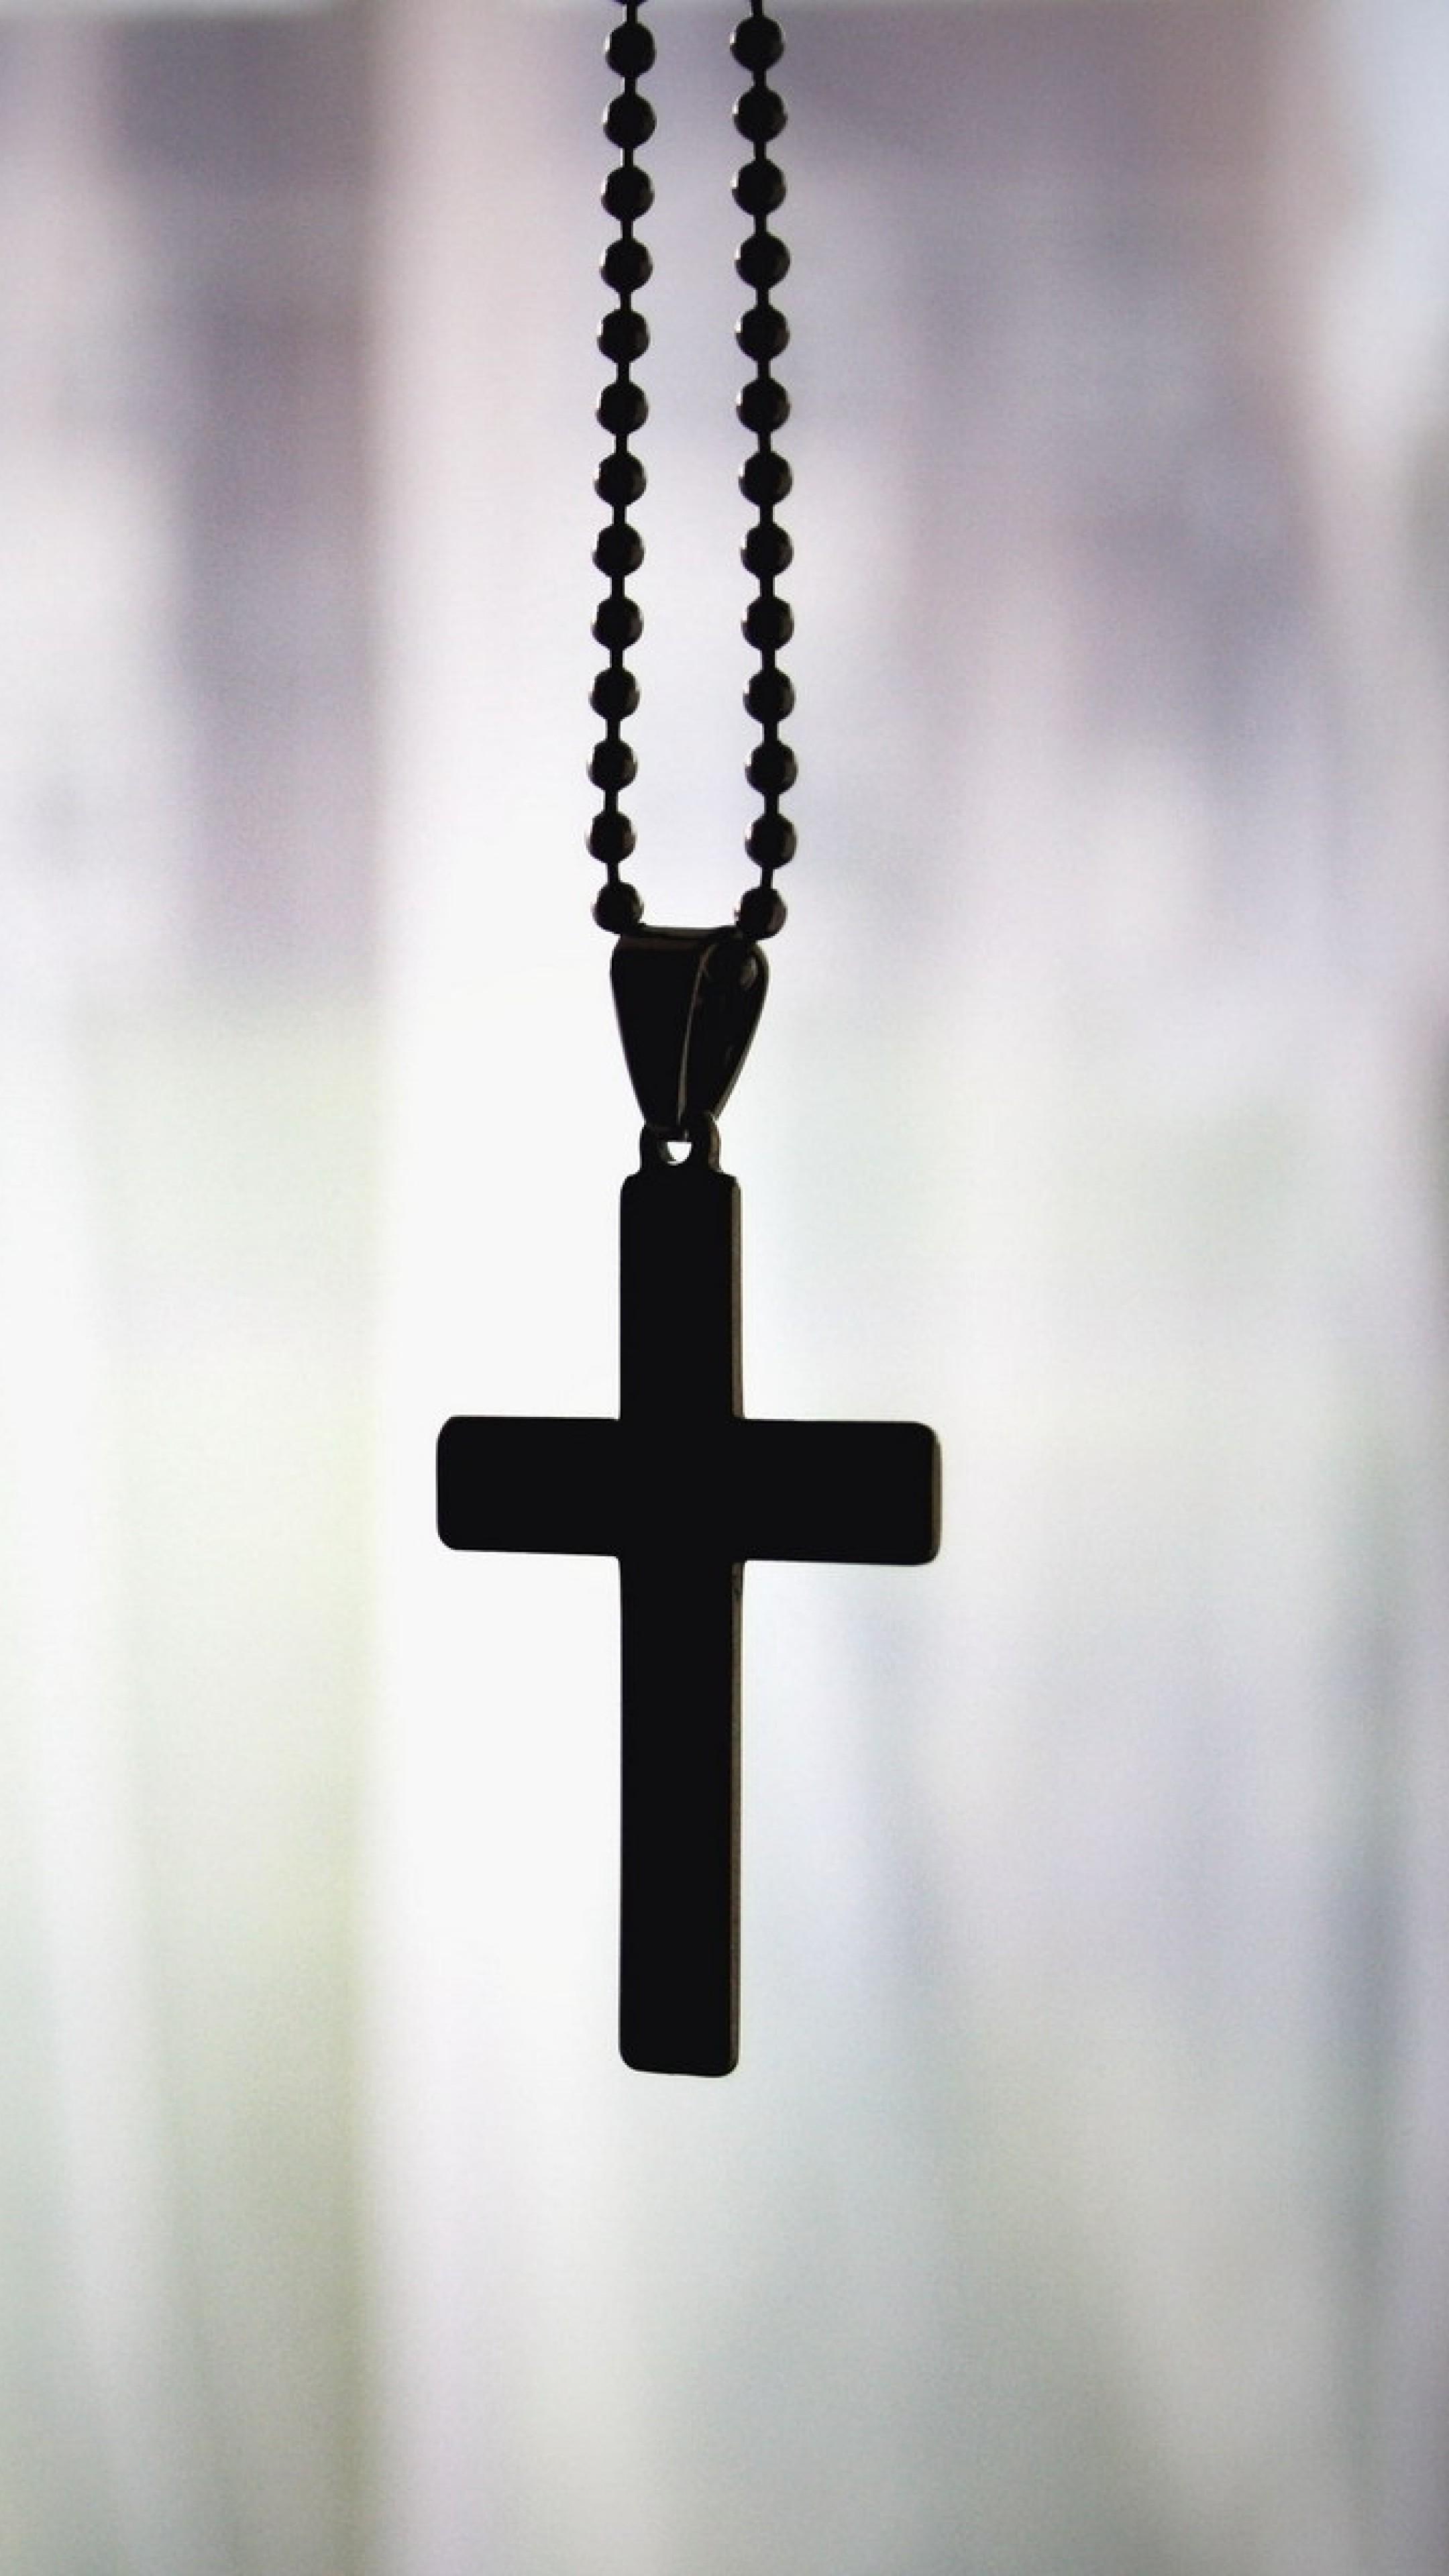 Wallpaper cross, pendant, chain, faith, christianity, orthodoxy